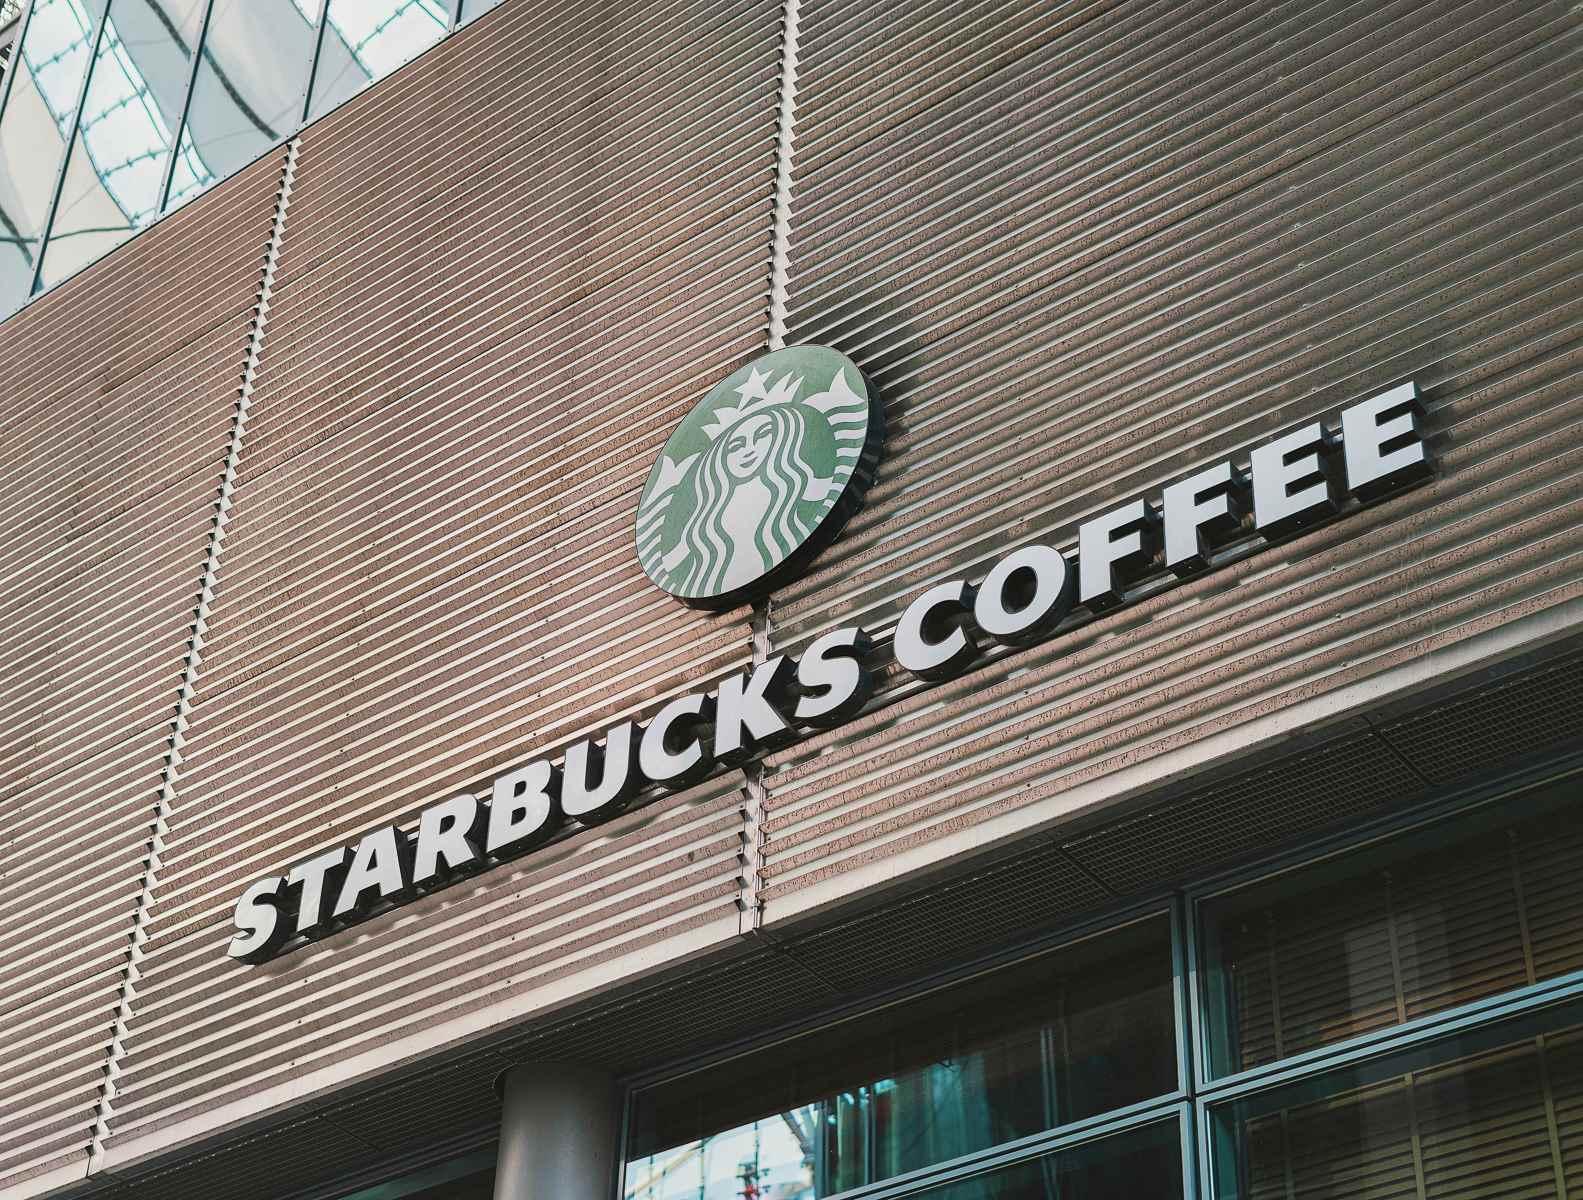 Starbucks Café im Sony Center am Potsdamer Platz